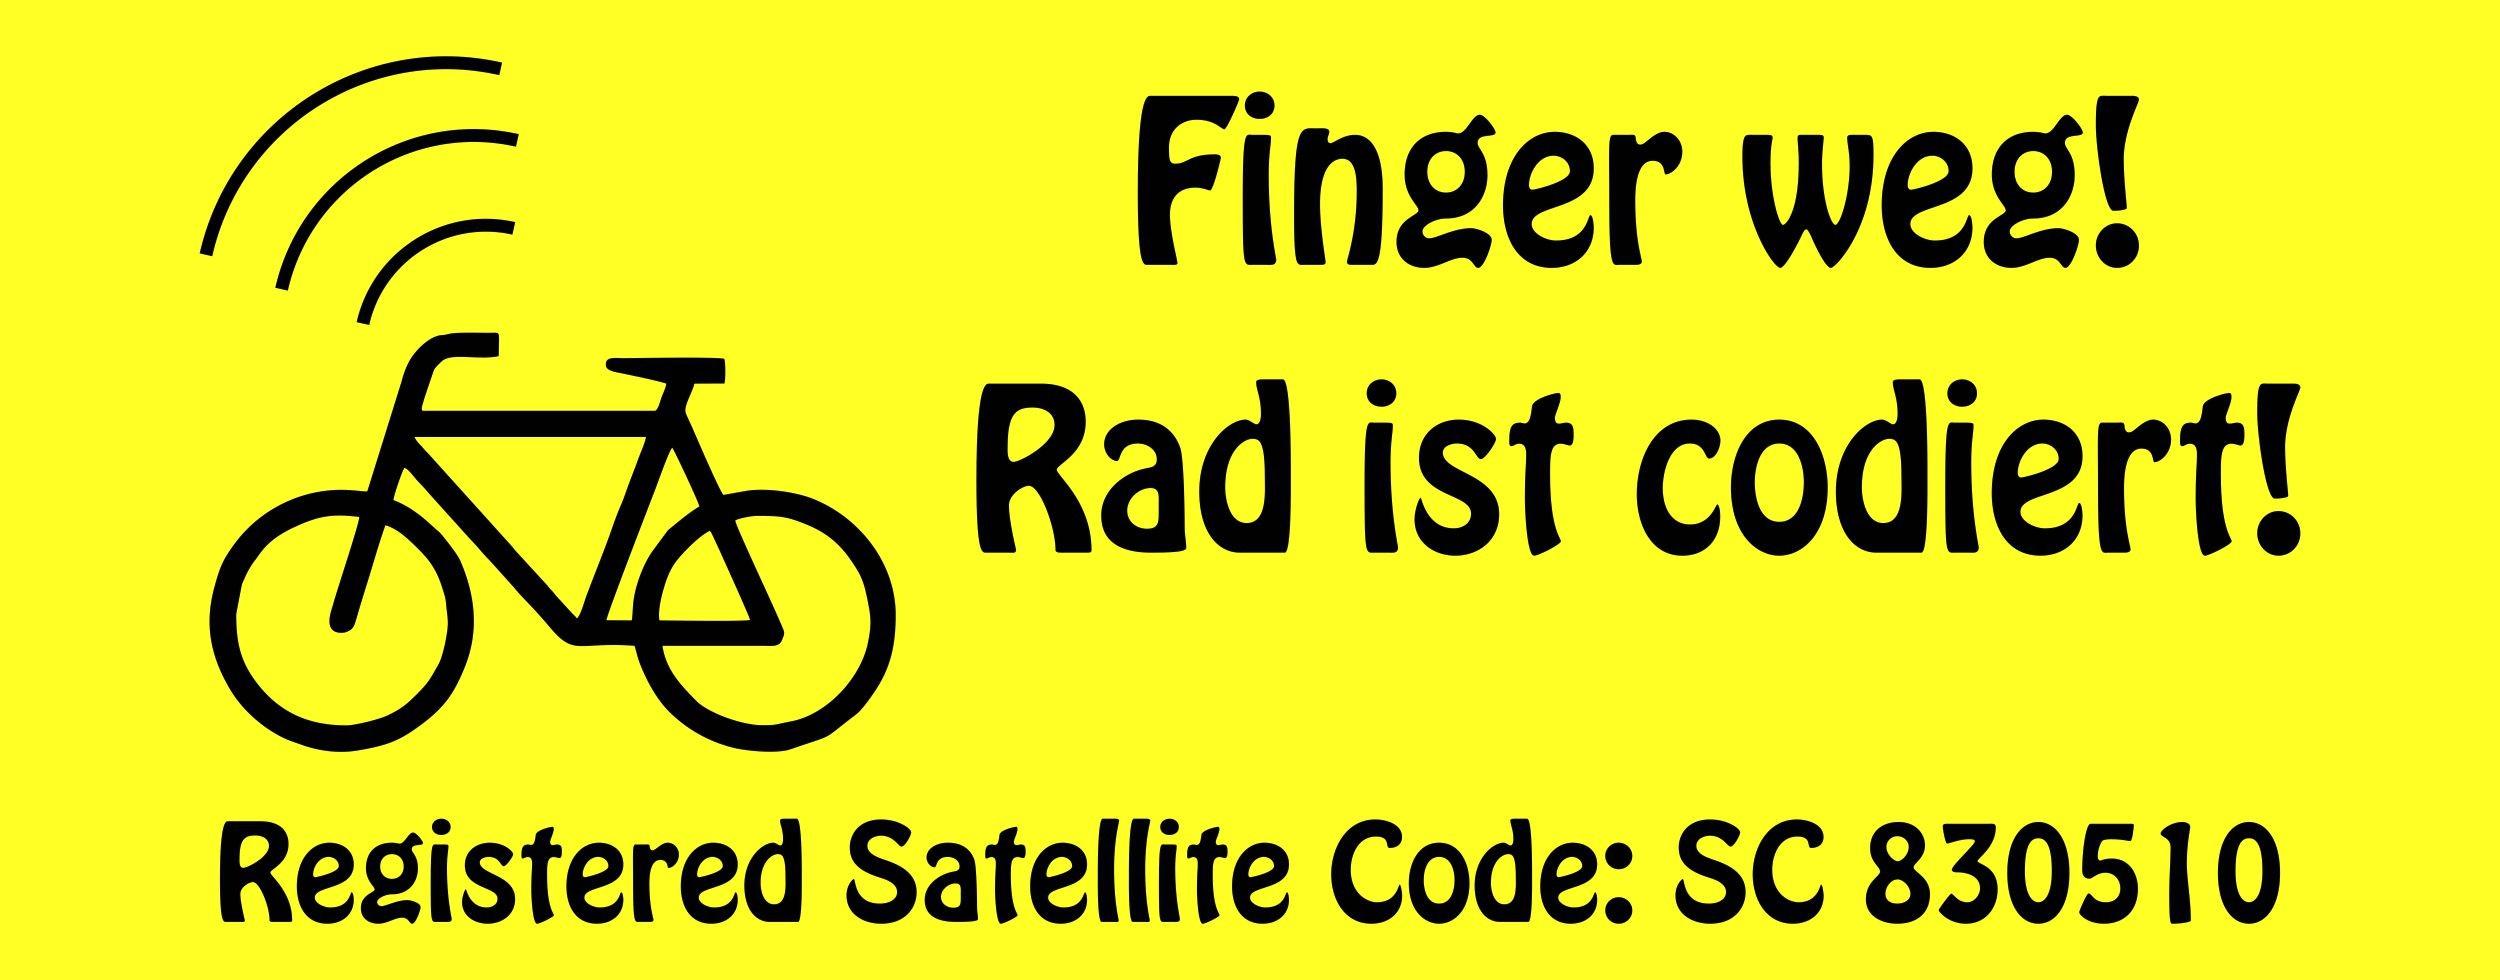 Autocollant Finger weg! Rad ist codiert! Registered Satellite: SC 830510 jaune – Bild 1